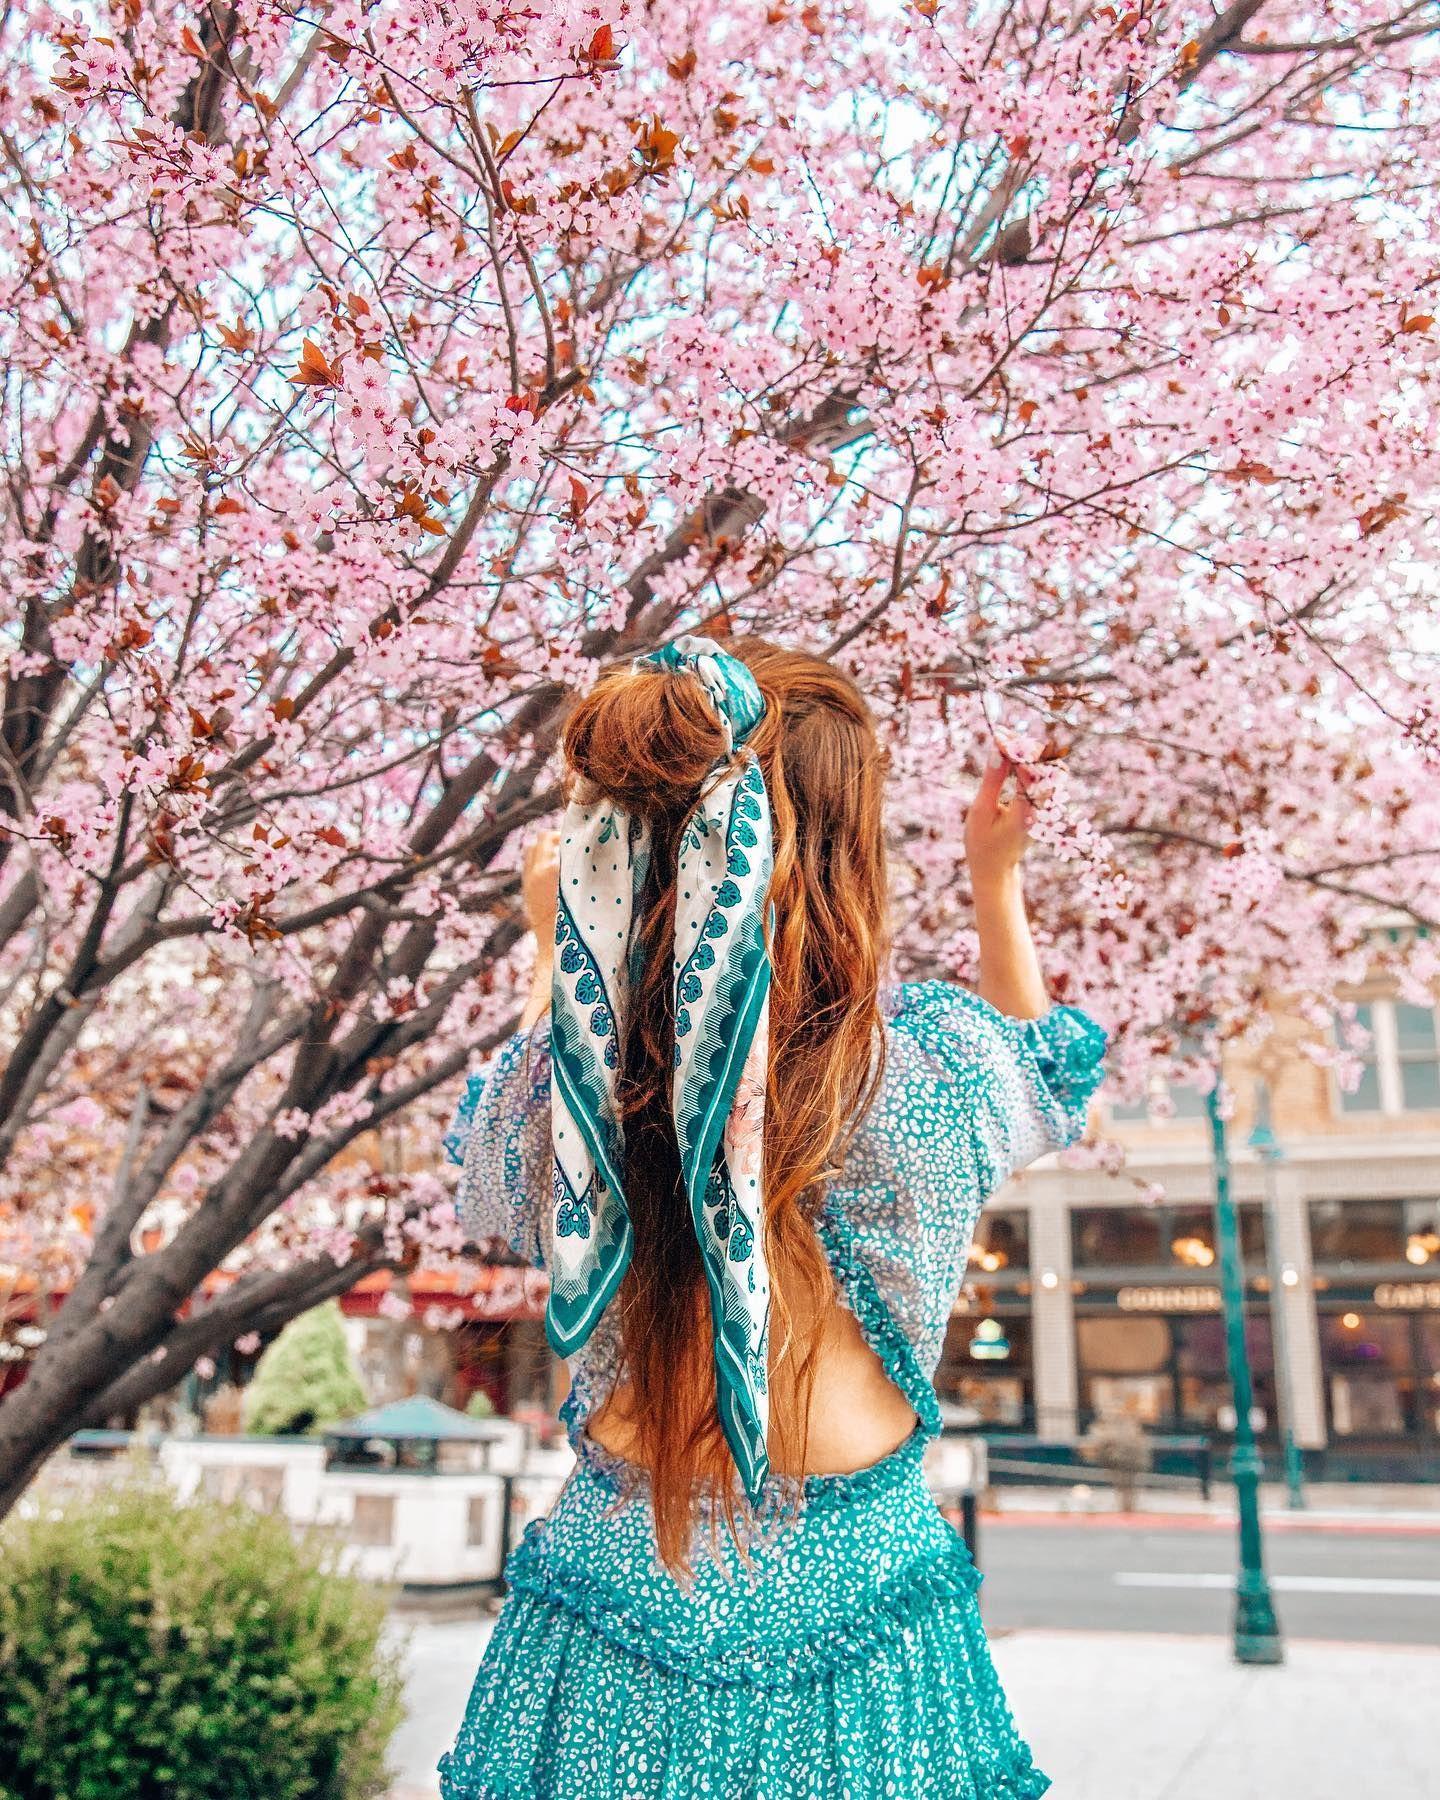 Cherry Blossoms In Reno Nevada Photo Instagram Instagram Photo